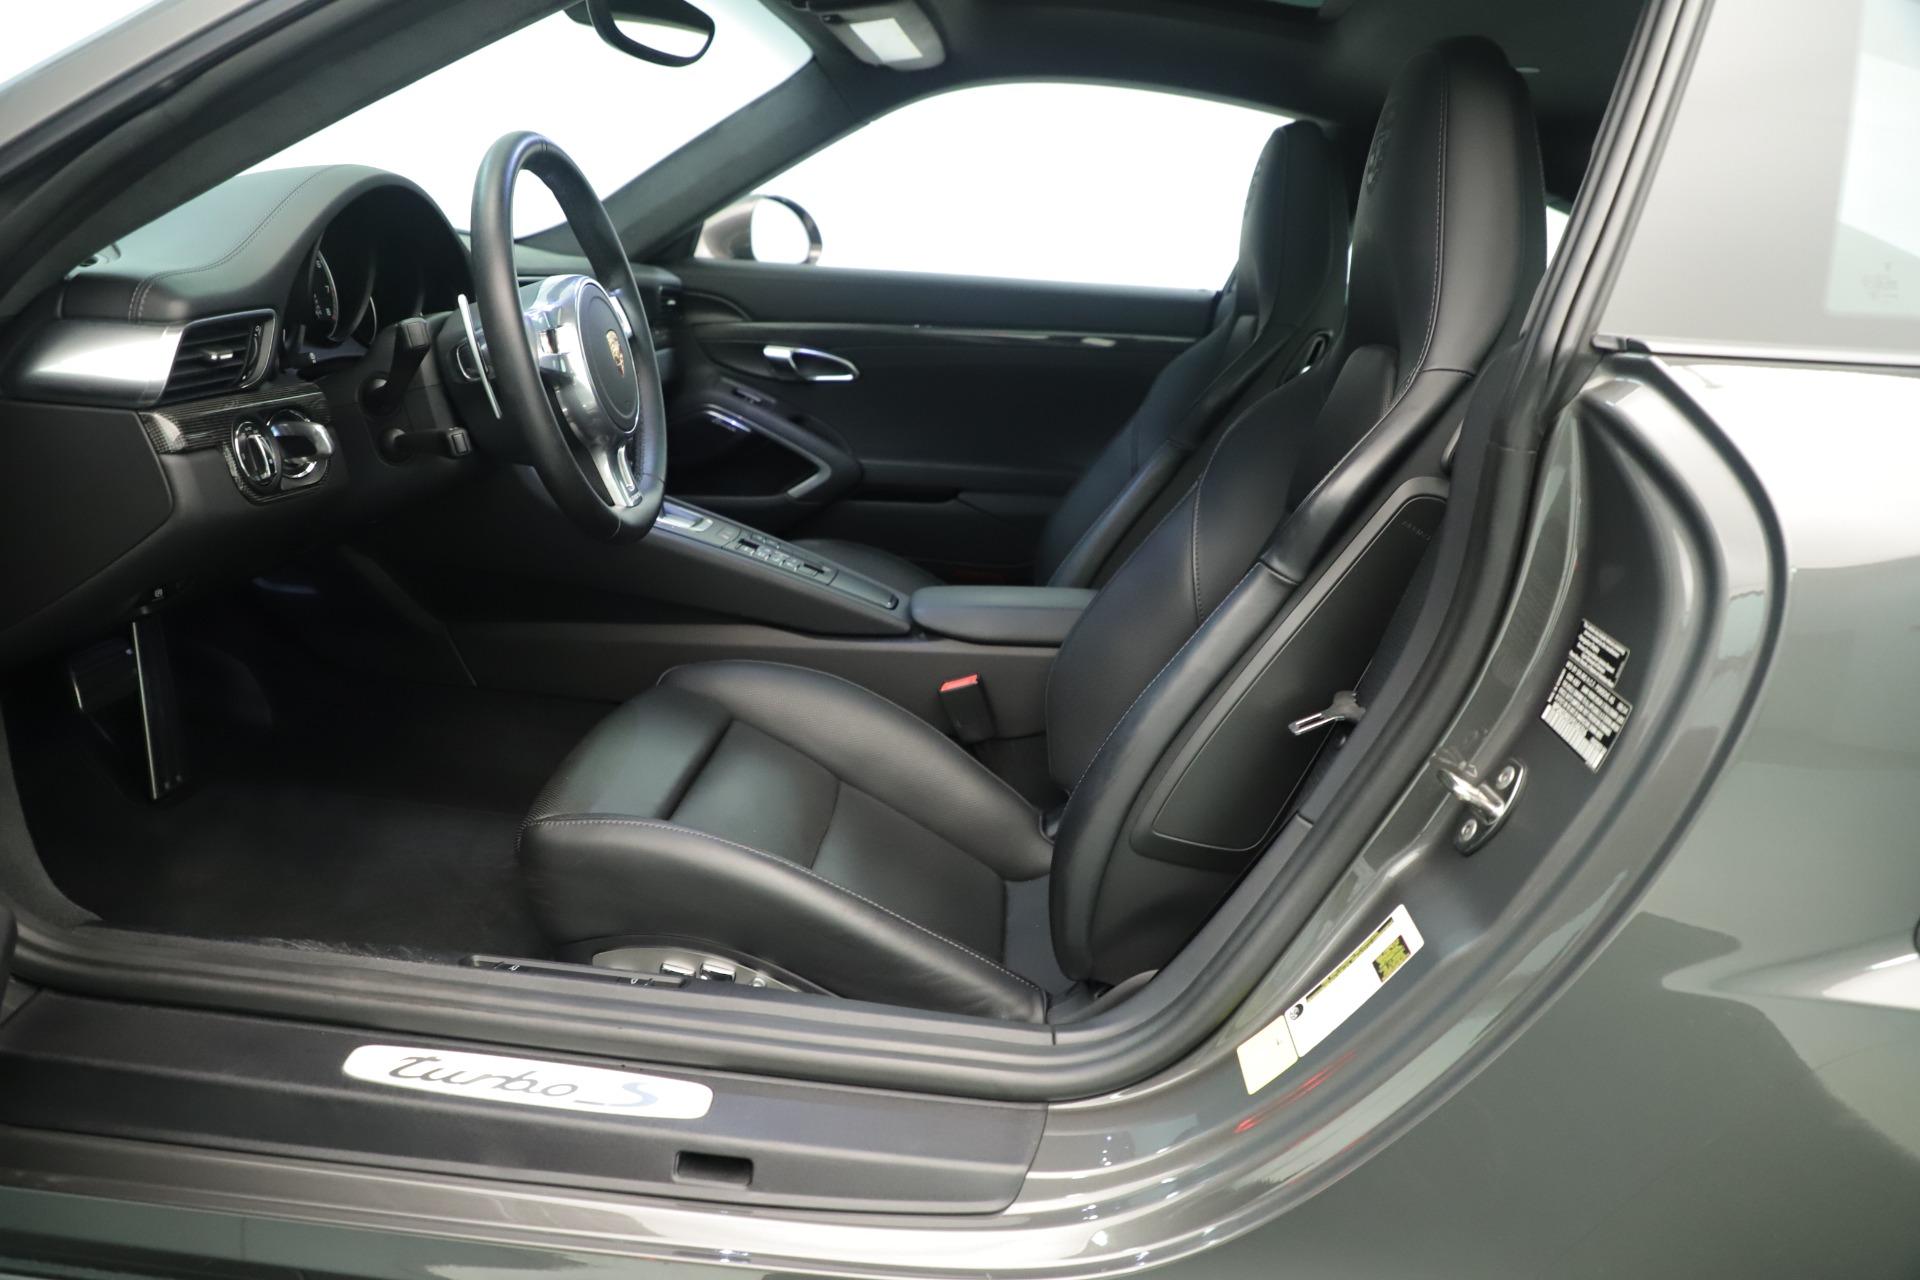 Used 2015 Porsche 911 Turbo S For Sale In Greenwich, CT 3429_p15